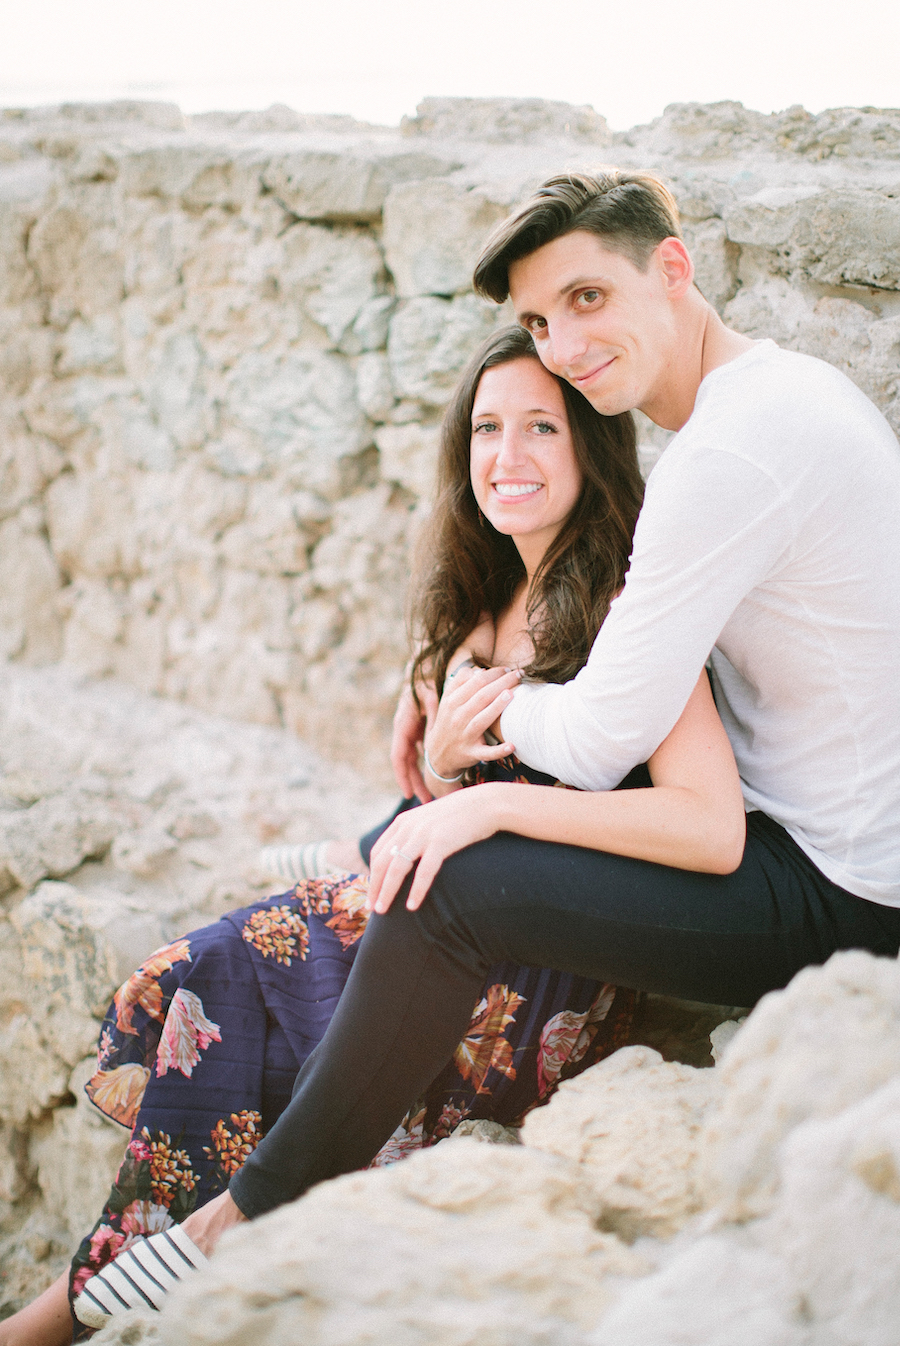 saya-photography-french-riviera-pre-wedding-by-sea-72.jpg